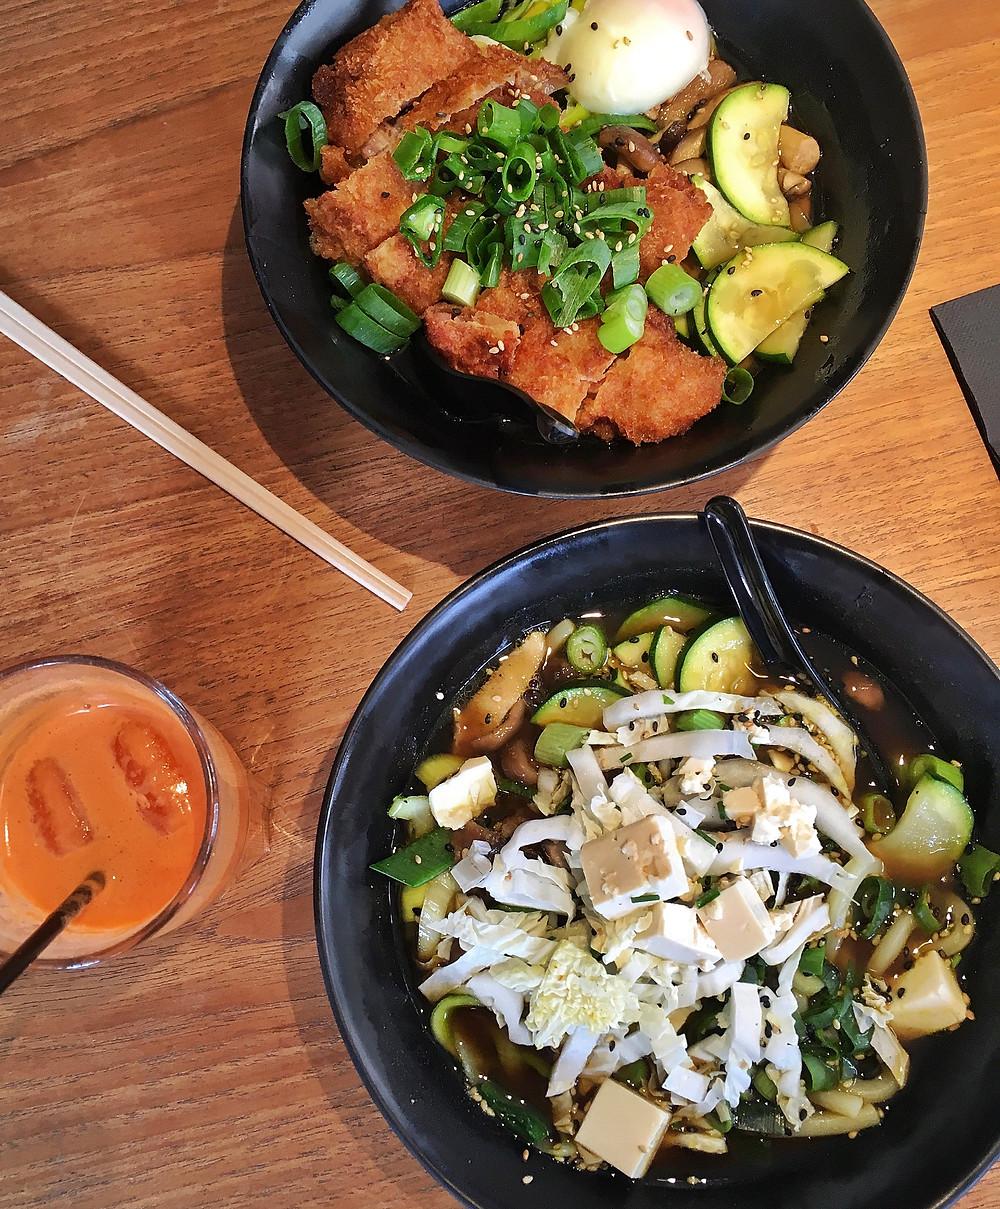 Food at Little Tokyo, Brussels, Belgium